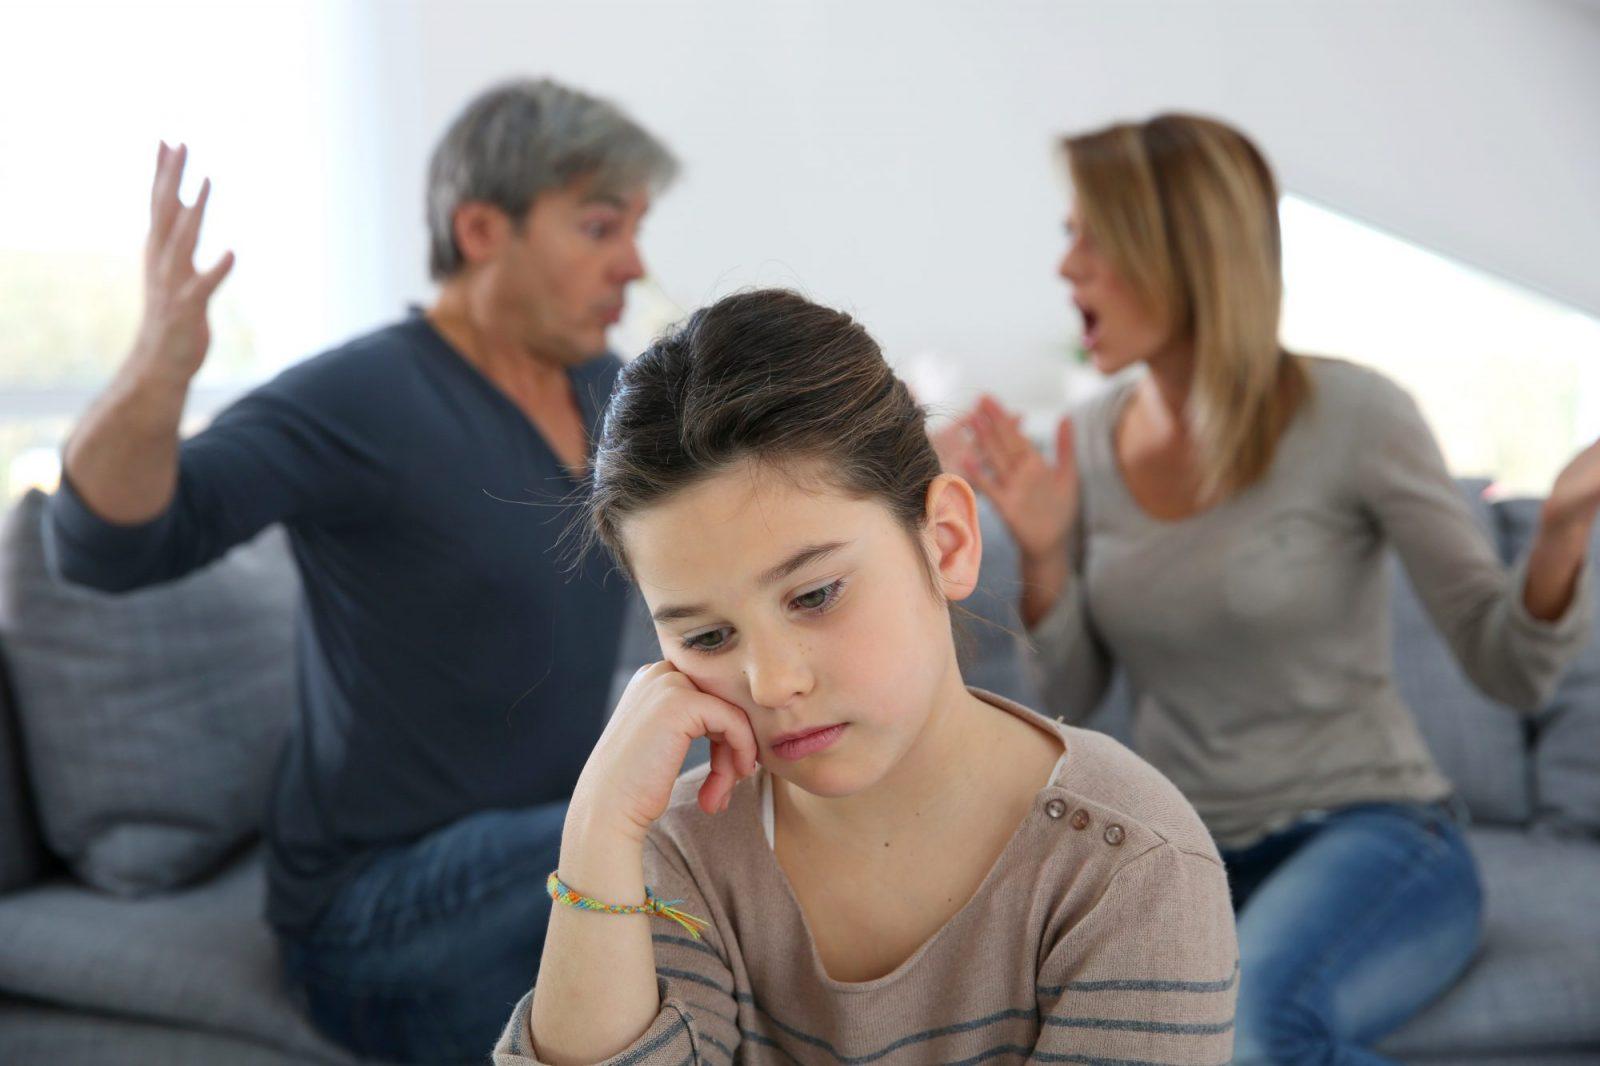 Echtscheiding Ouders Ruzie Kind Verdrietig